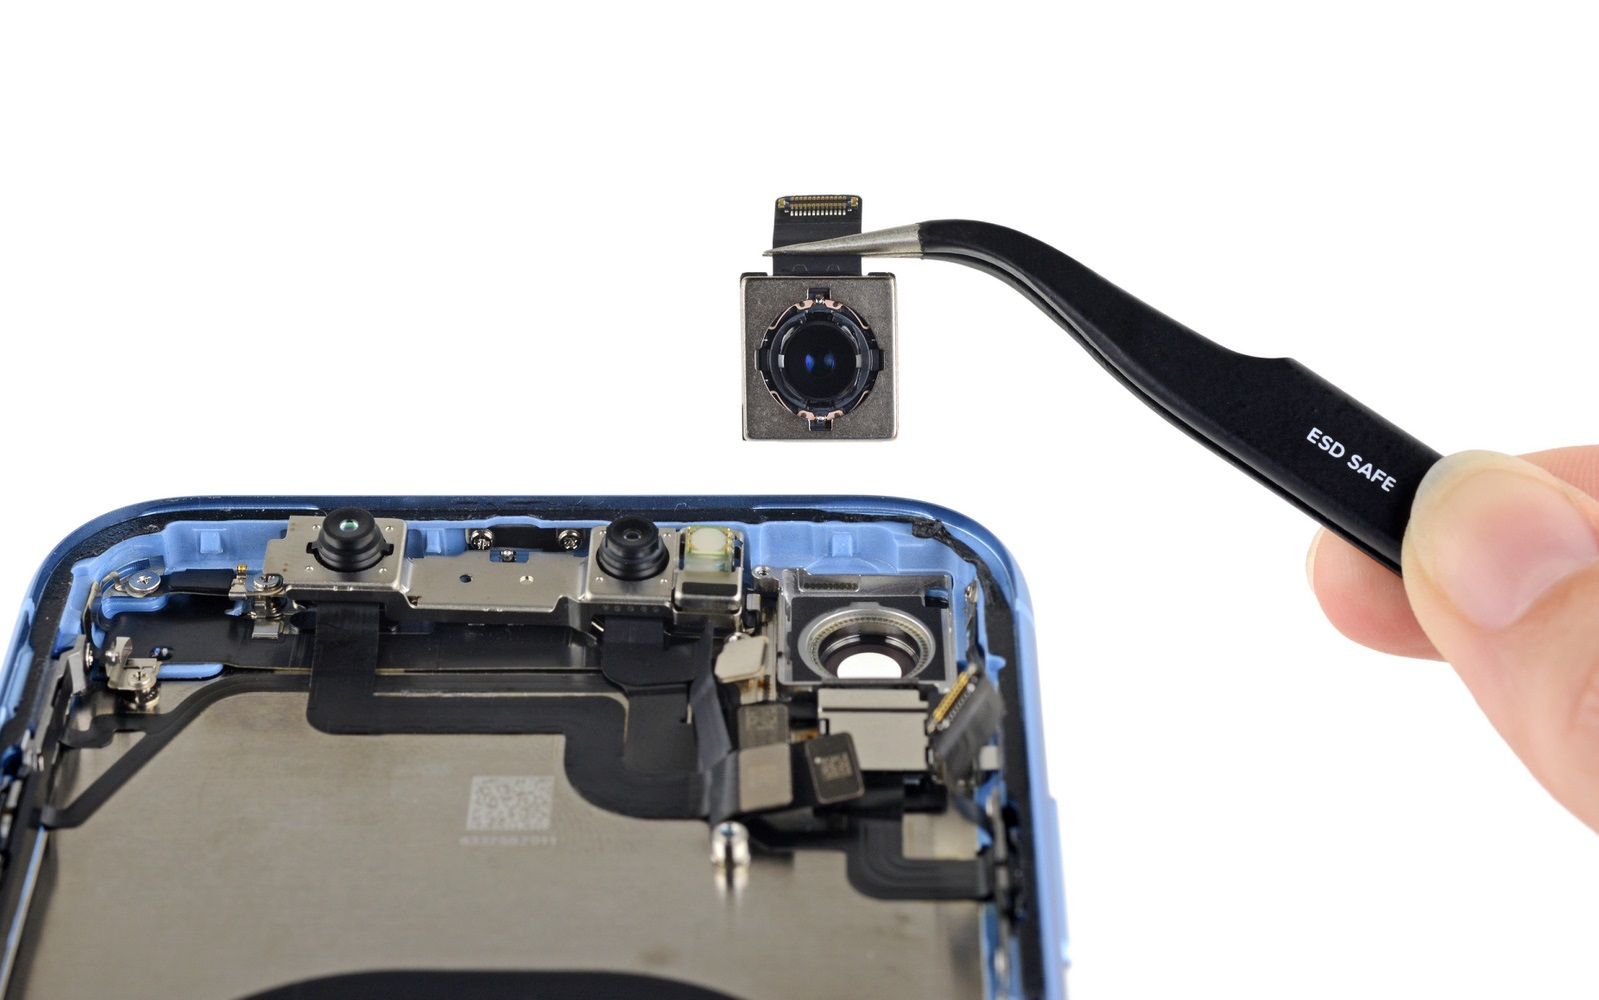 Apple iPhone XR разобран экспертами iFixit - фото 2 | Сервисный центр Total Apple